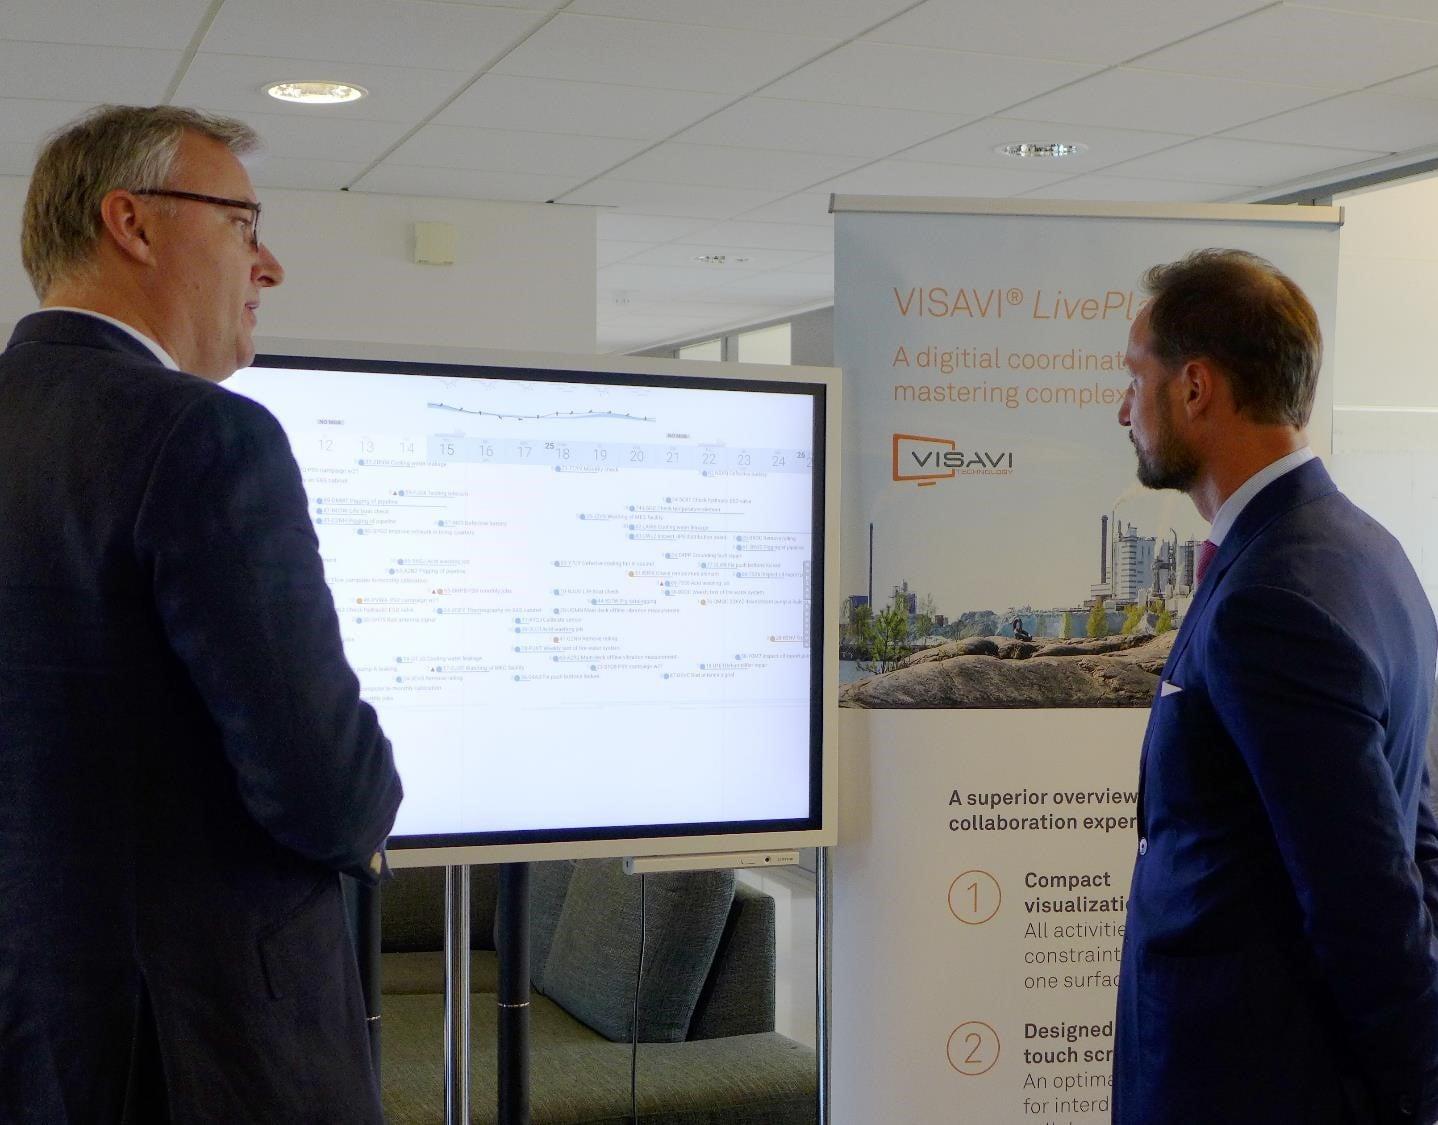 HRH Crown Prince Haakon visited innovation startups